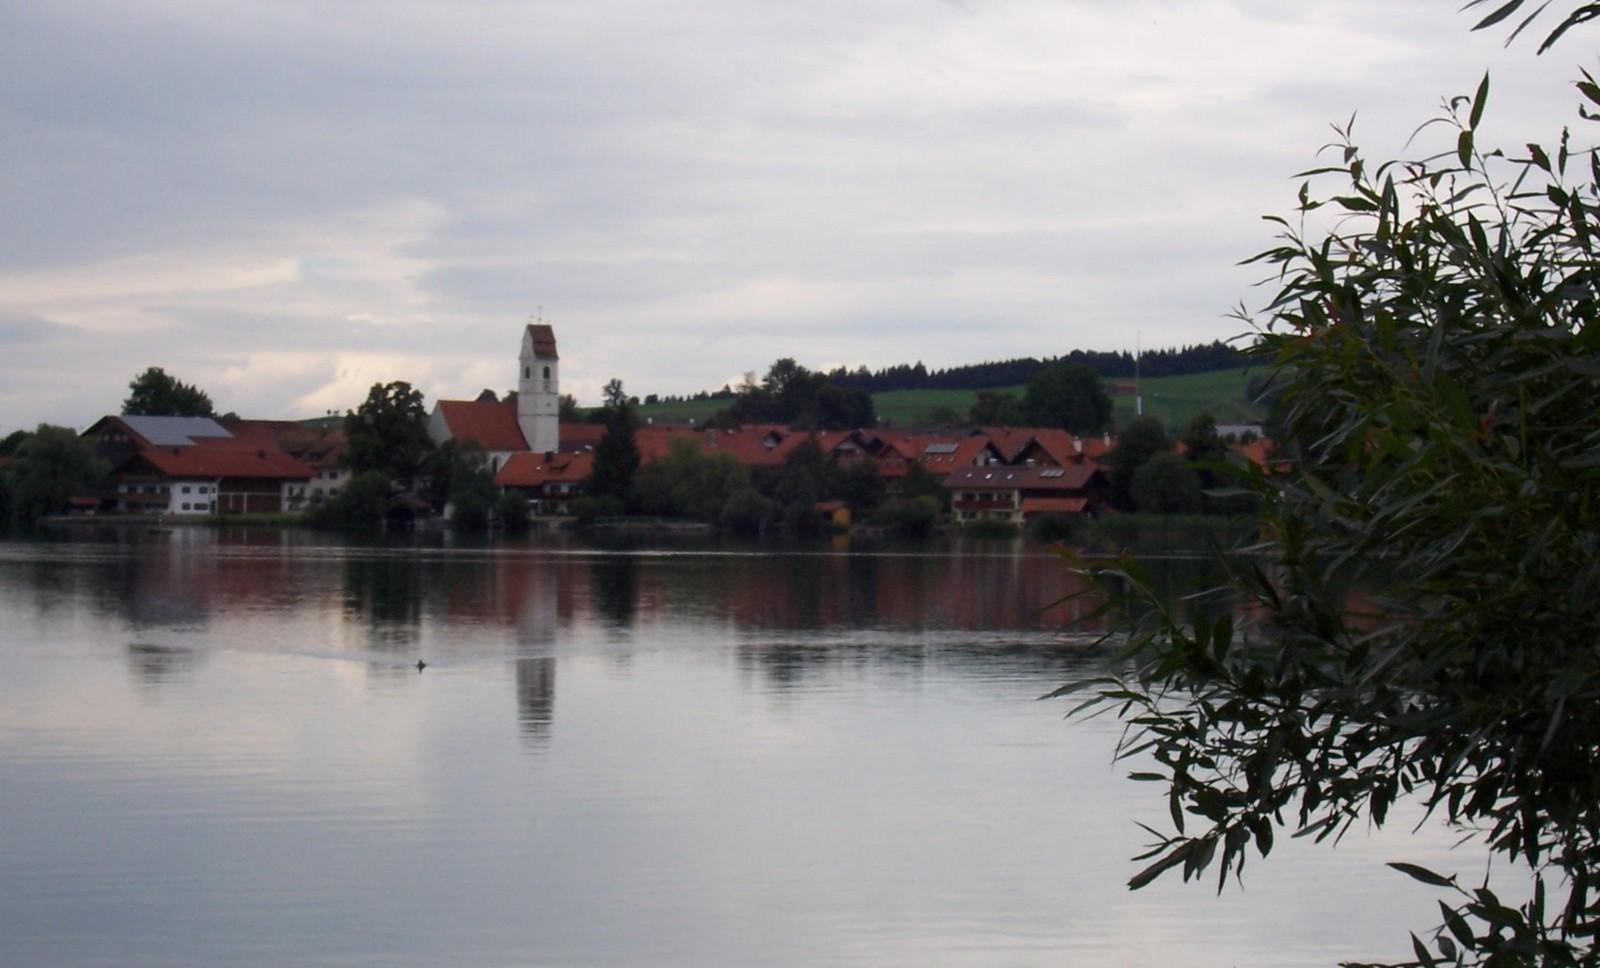 Das Blaue Land - Riegsee mit St. Stephan